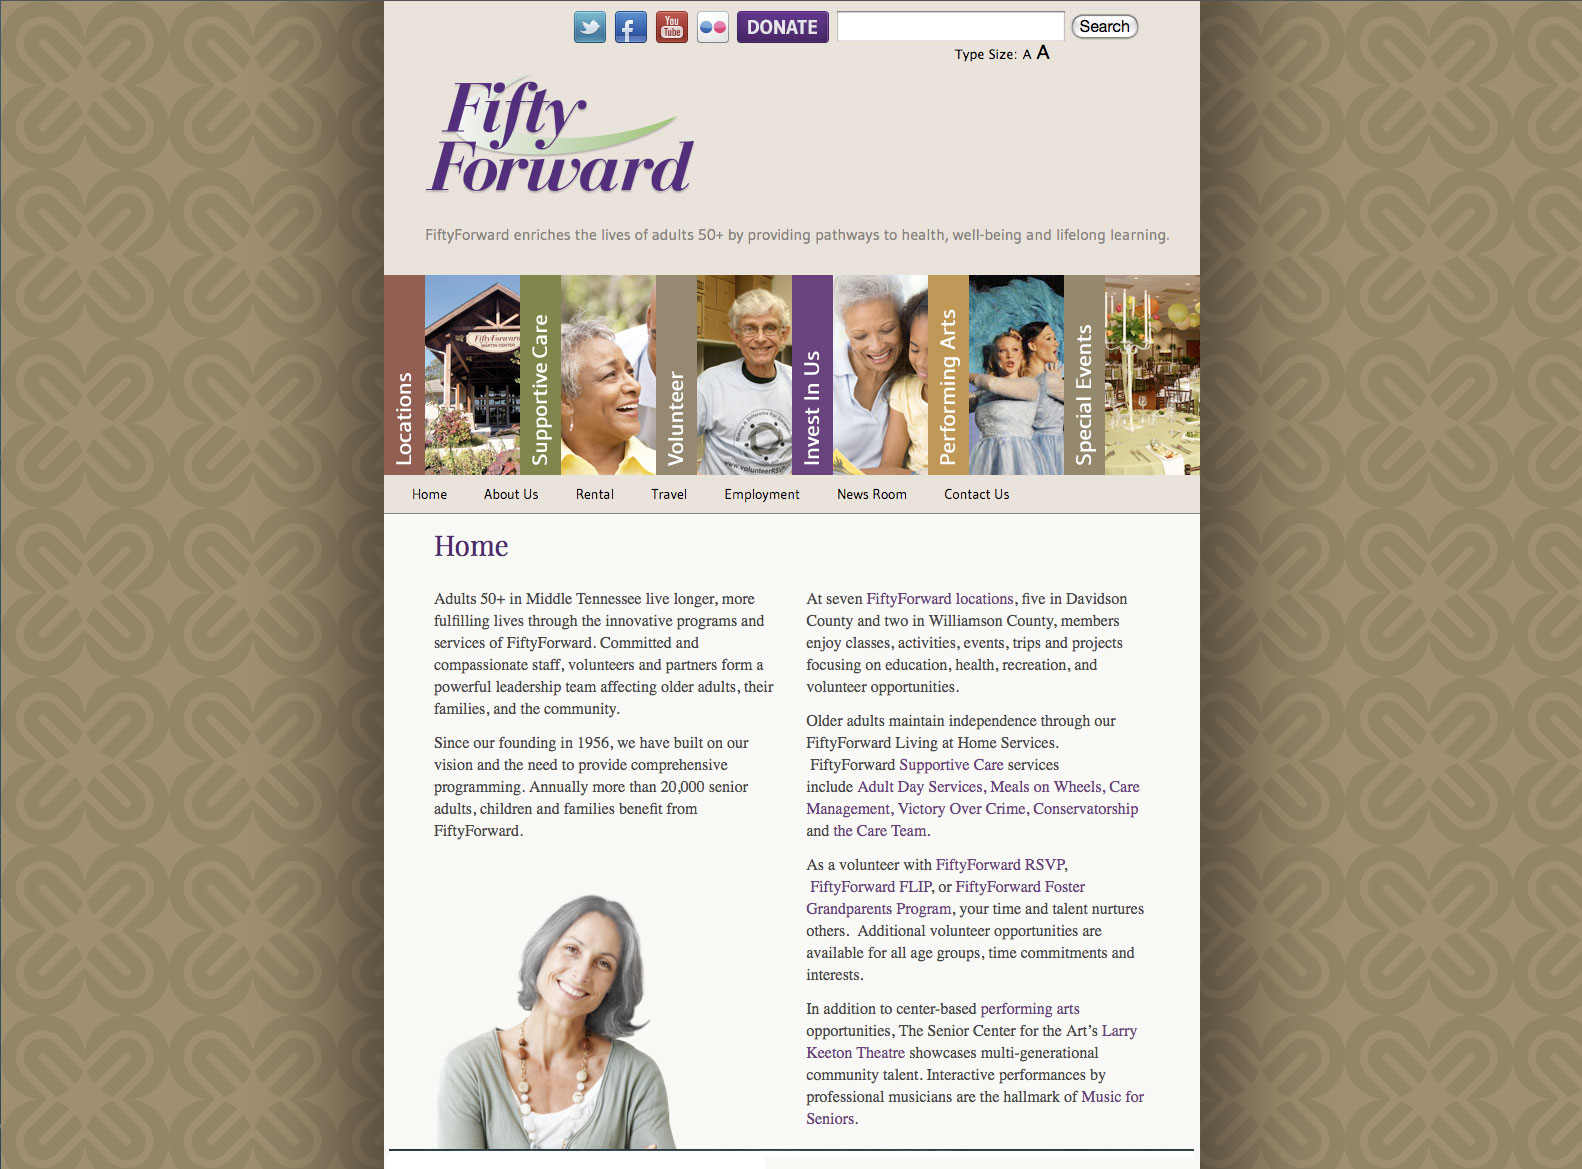 fiftyforward_home